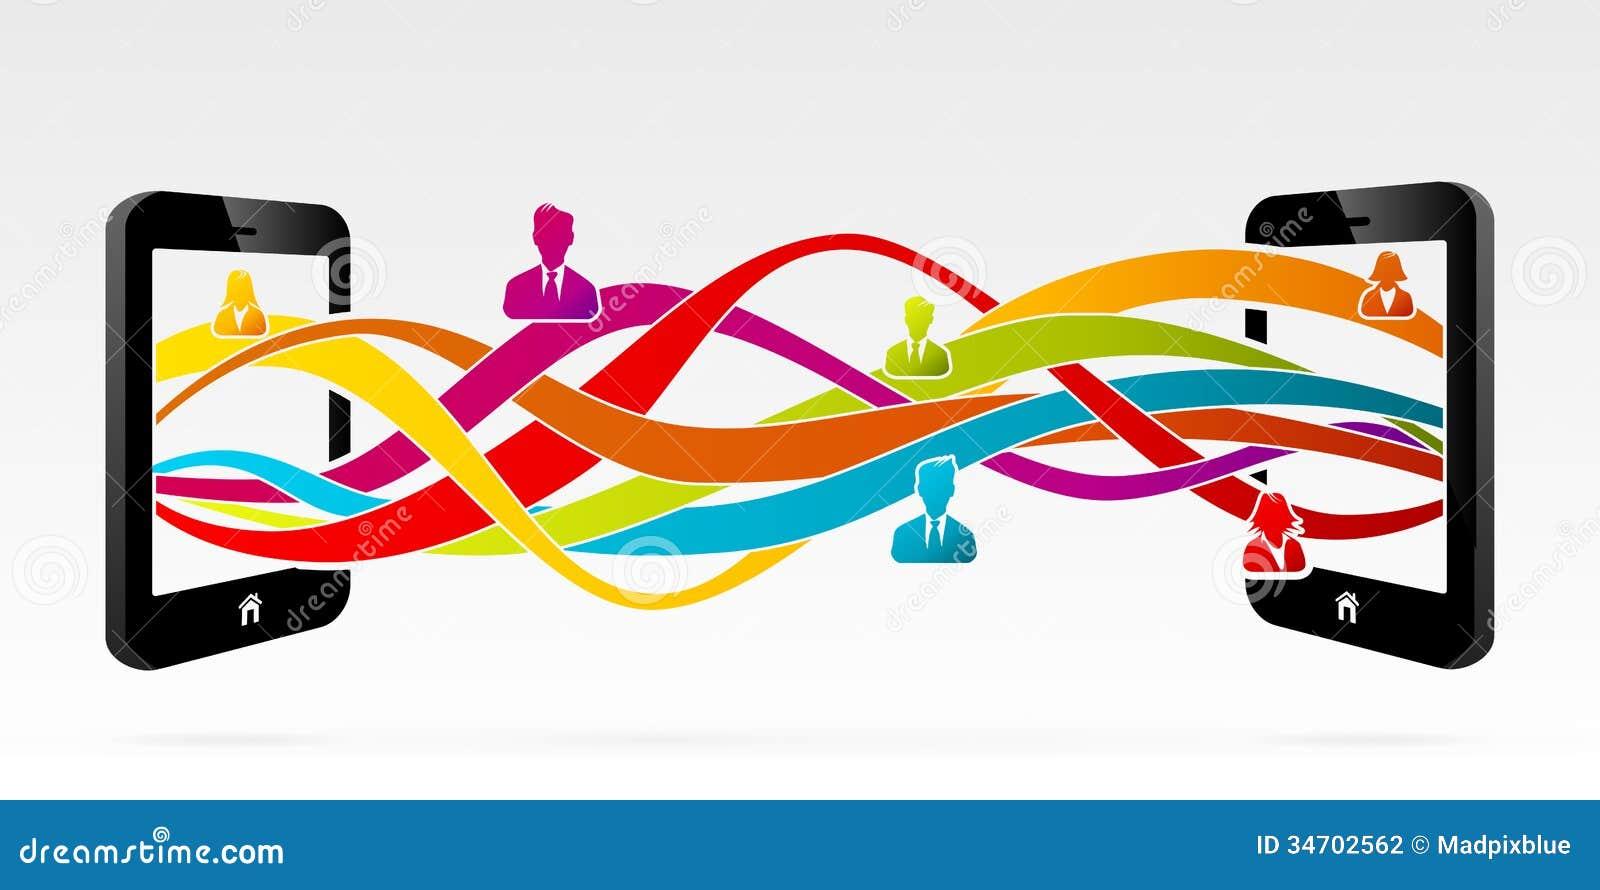 mobile phone information transfer stock vector illustration of